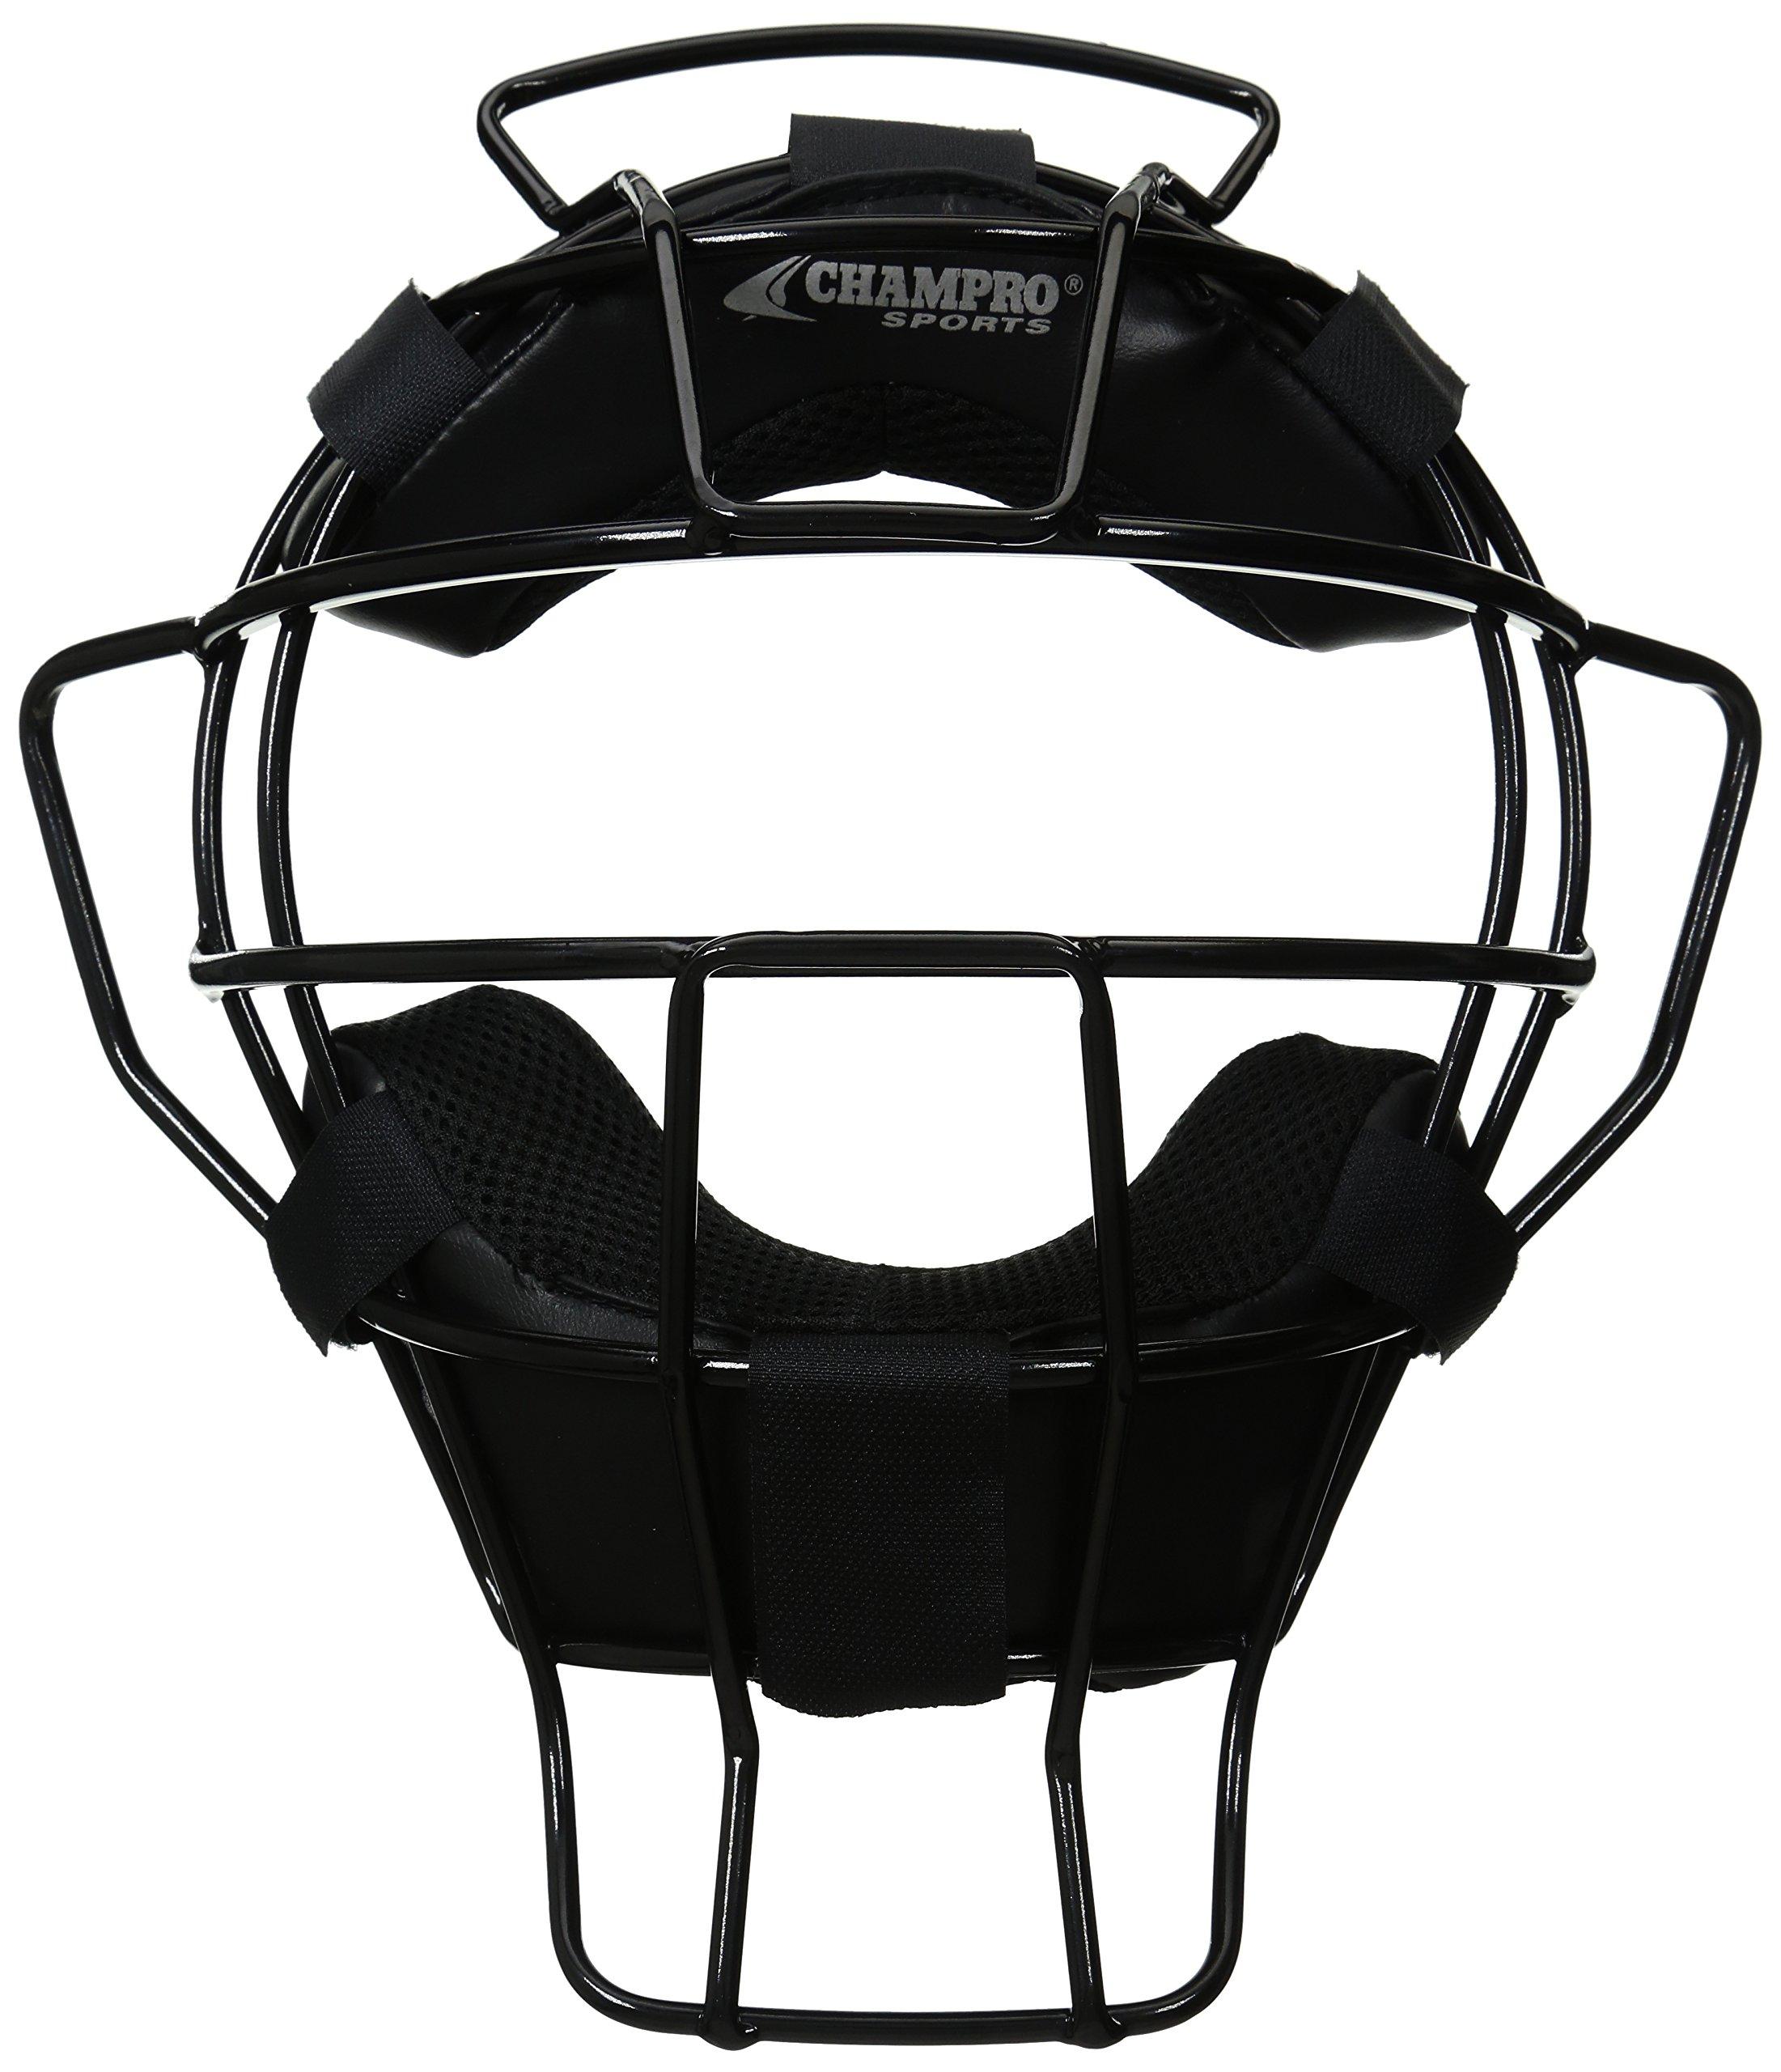 CHAMPRO Ump Mask DRI Gear Pads (Black, 18-Ounce) by CHAMPRO